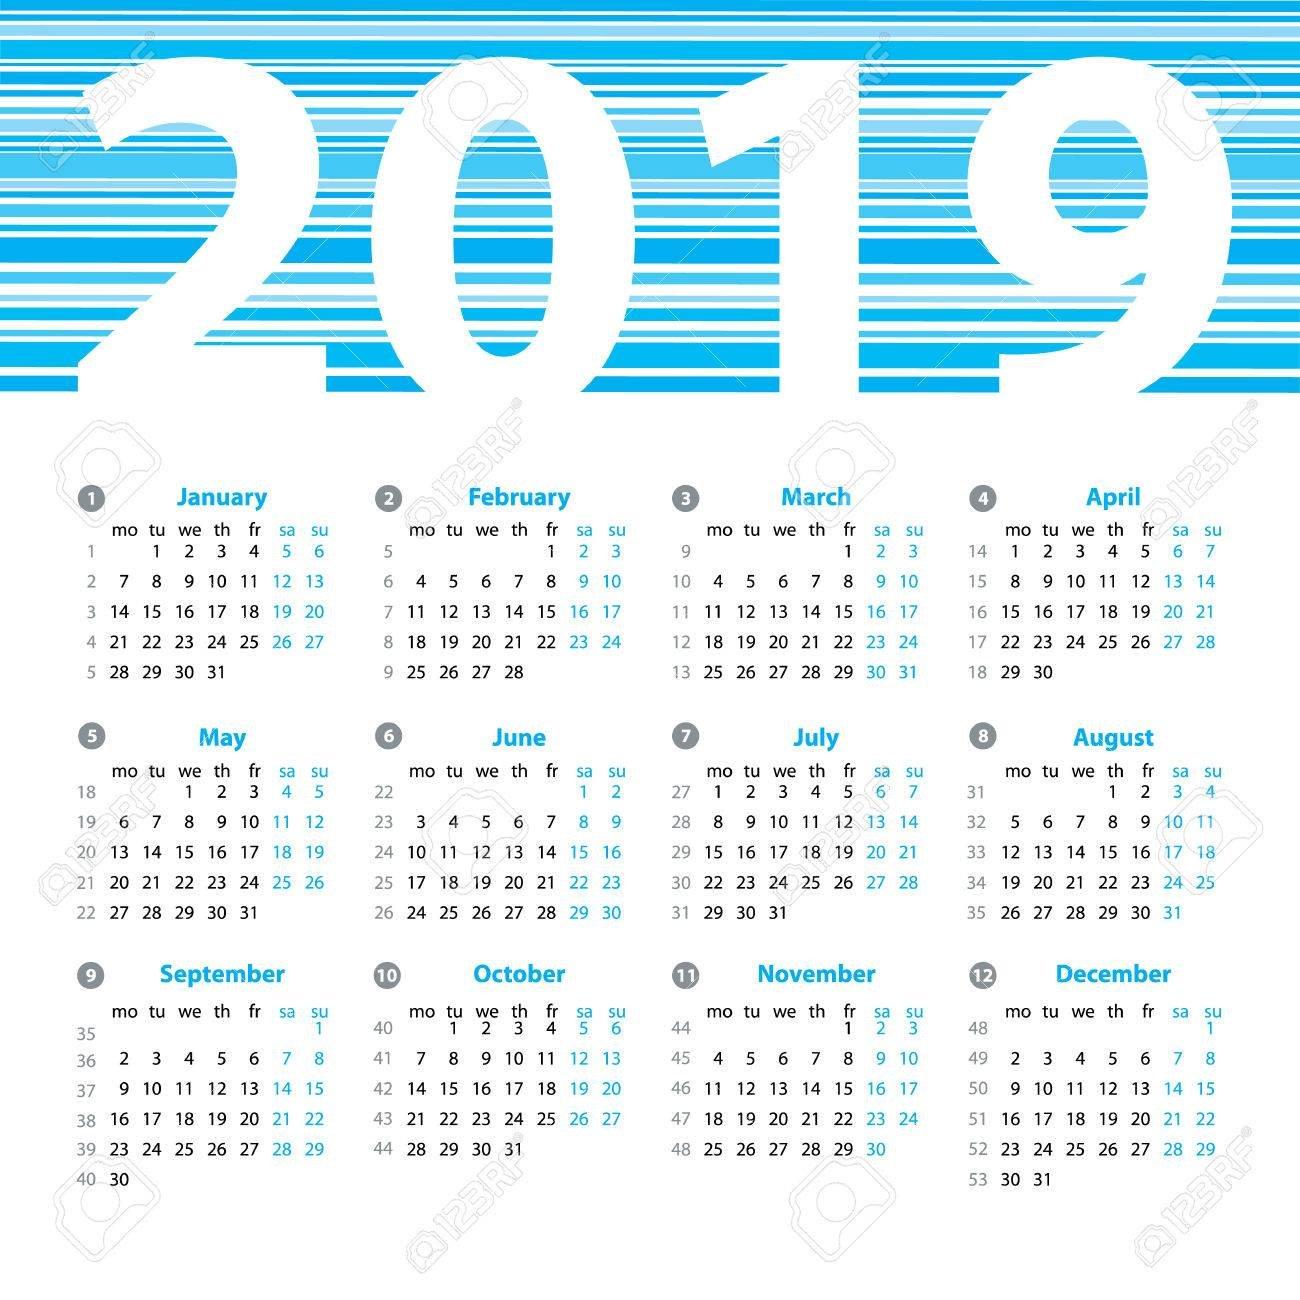 Calendar 2019 Year Vector Design Template With Week Numbers And Calendar Week 40 2019